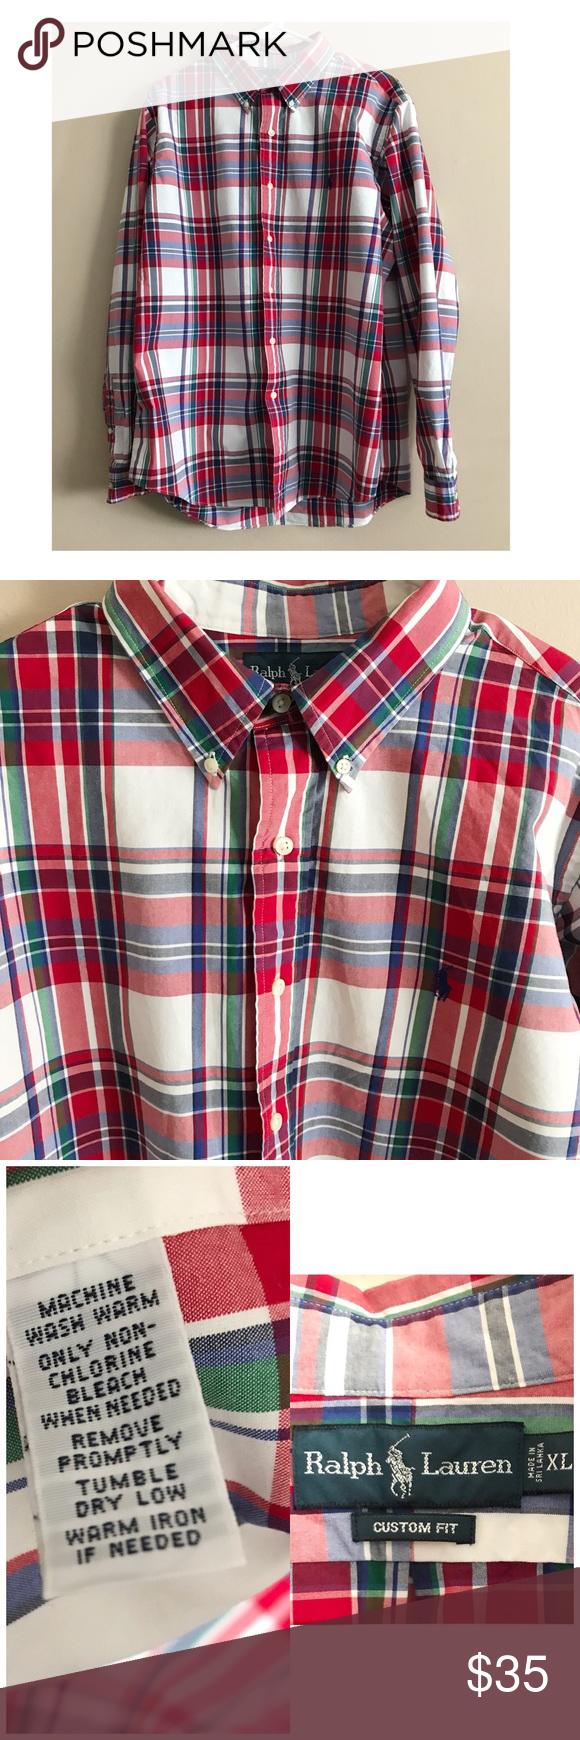 Custom Bleached U.S Polo Red Blue Plaid Shirt XL